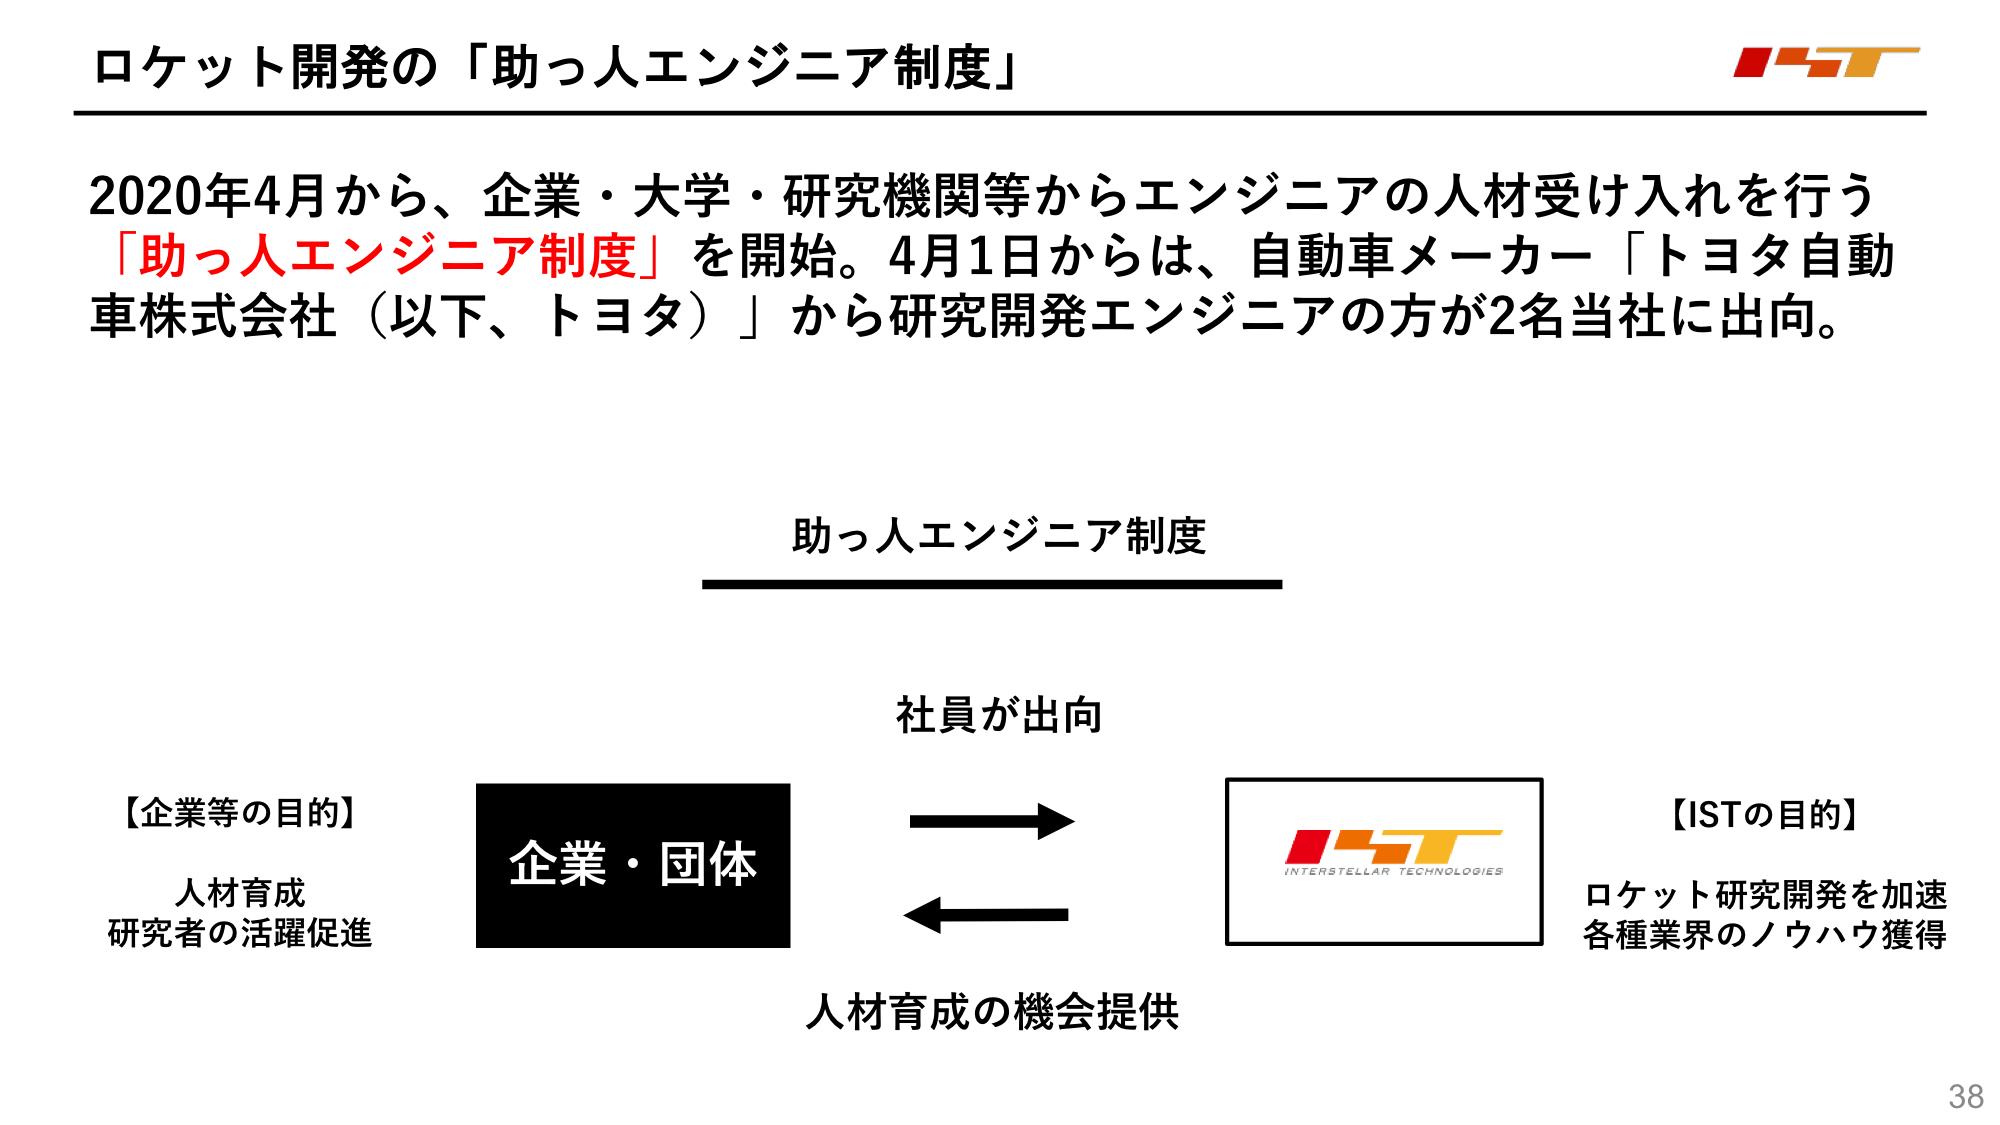 f:id:Imamura:20200603233322p:plain